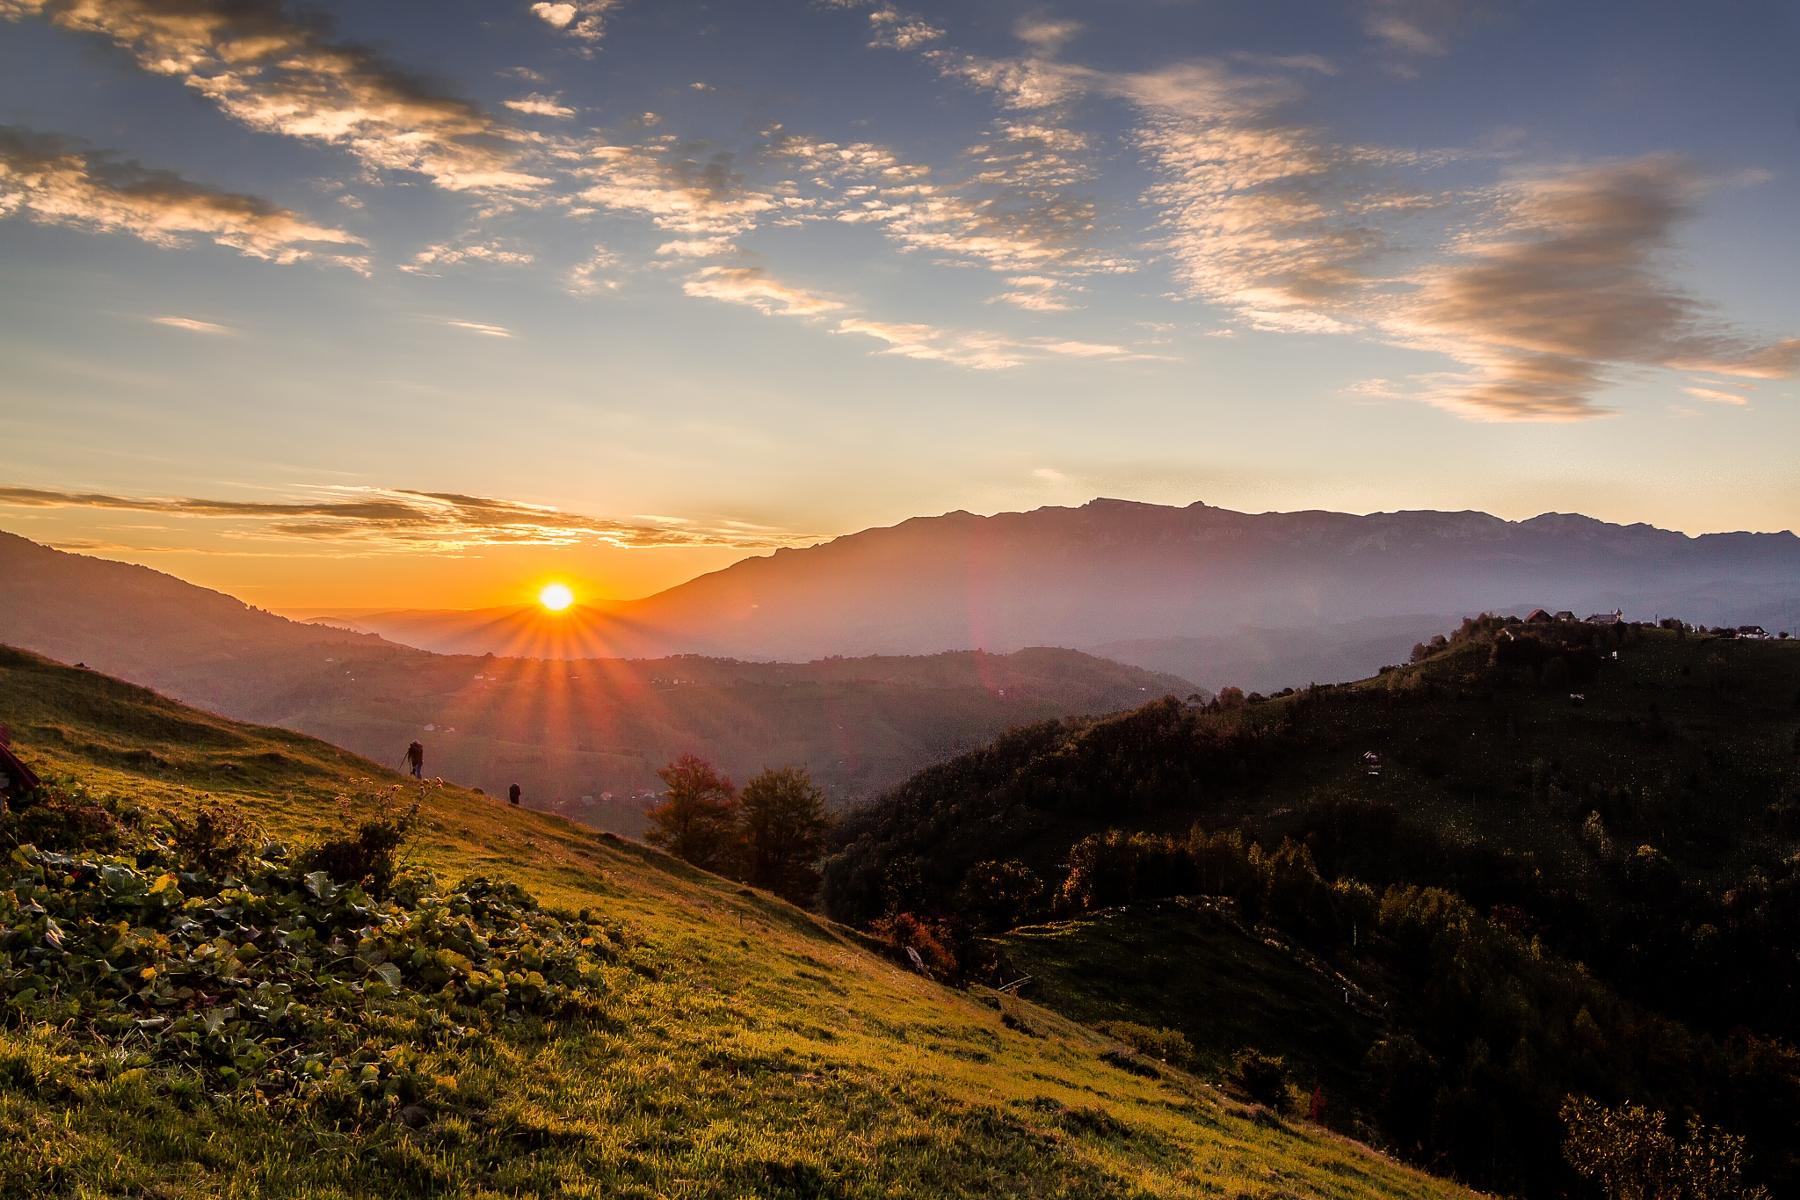 Piatria Craiului View from Akasha Wellness Retreat